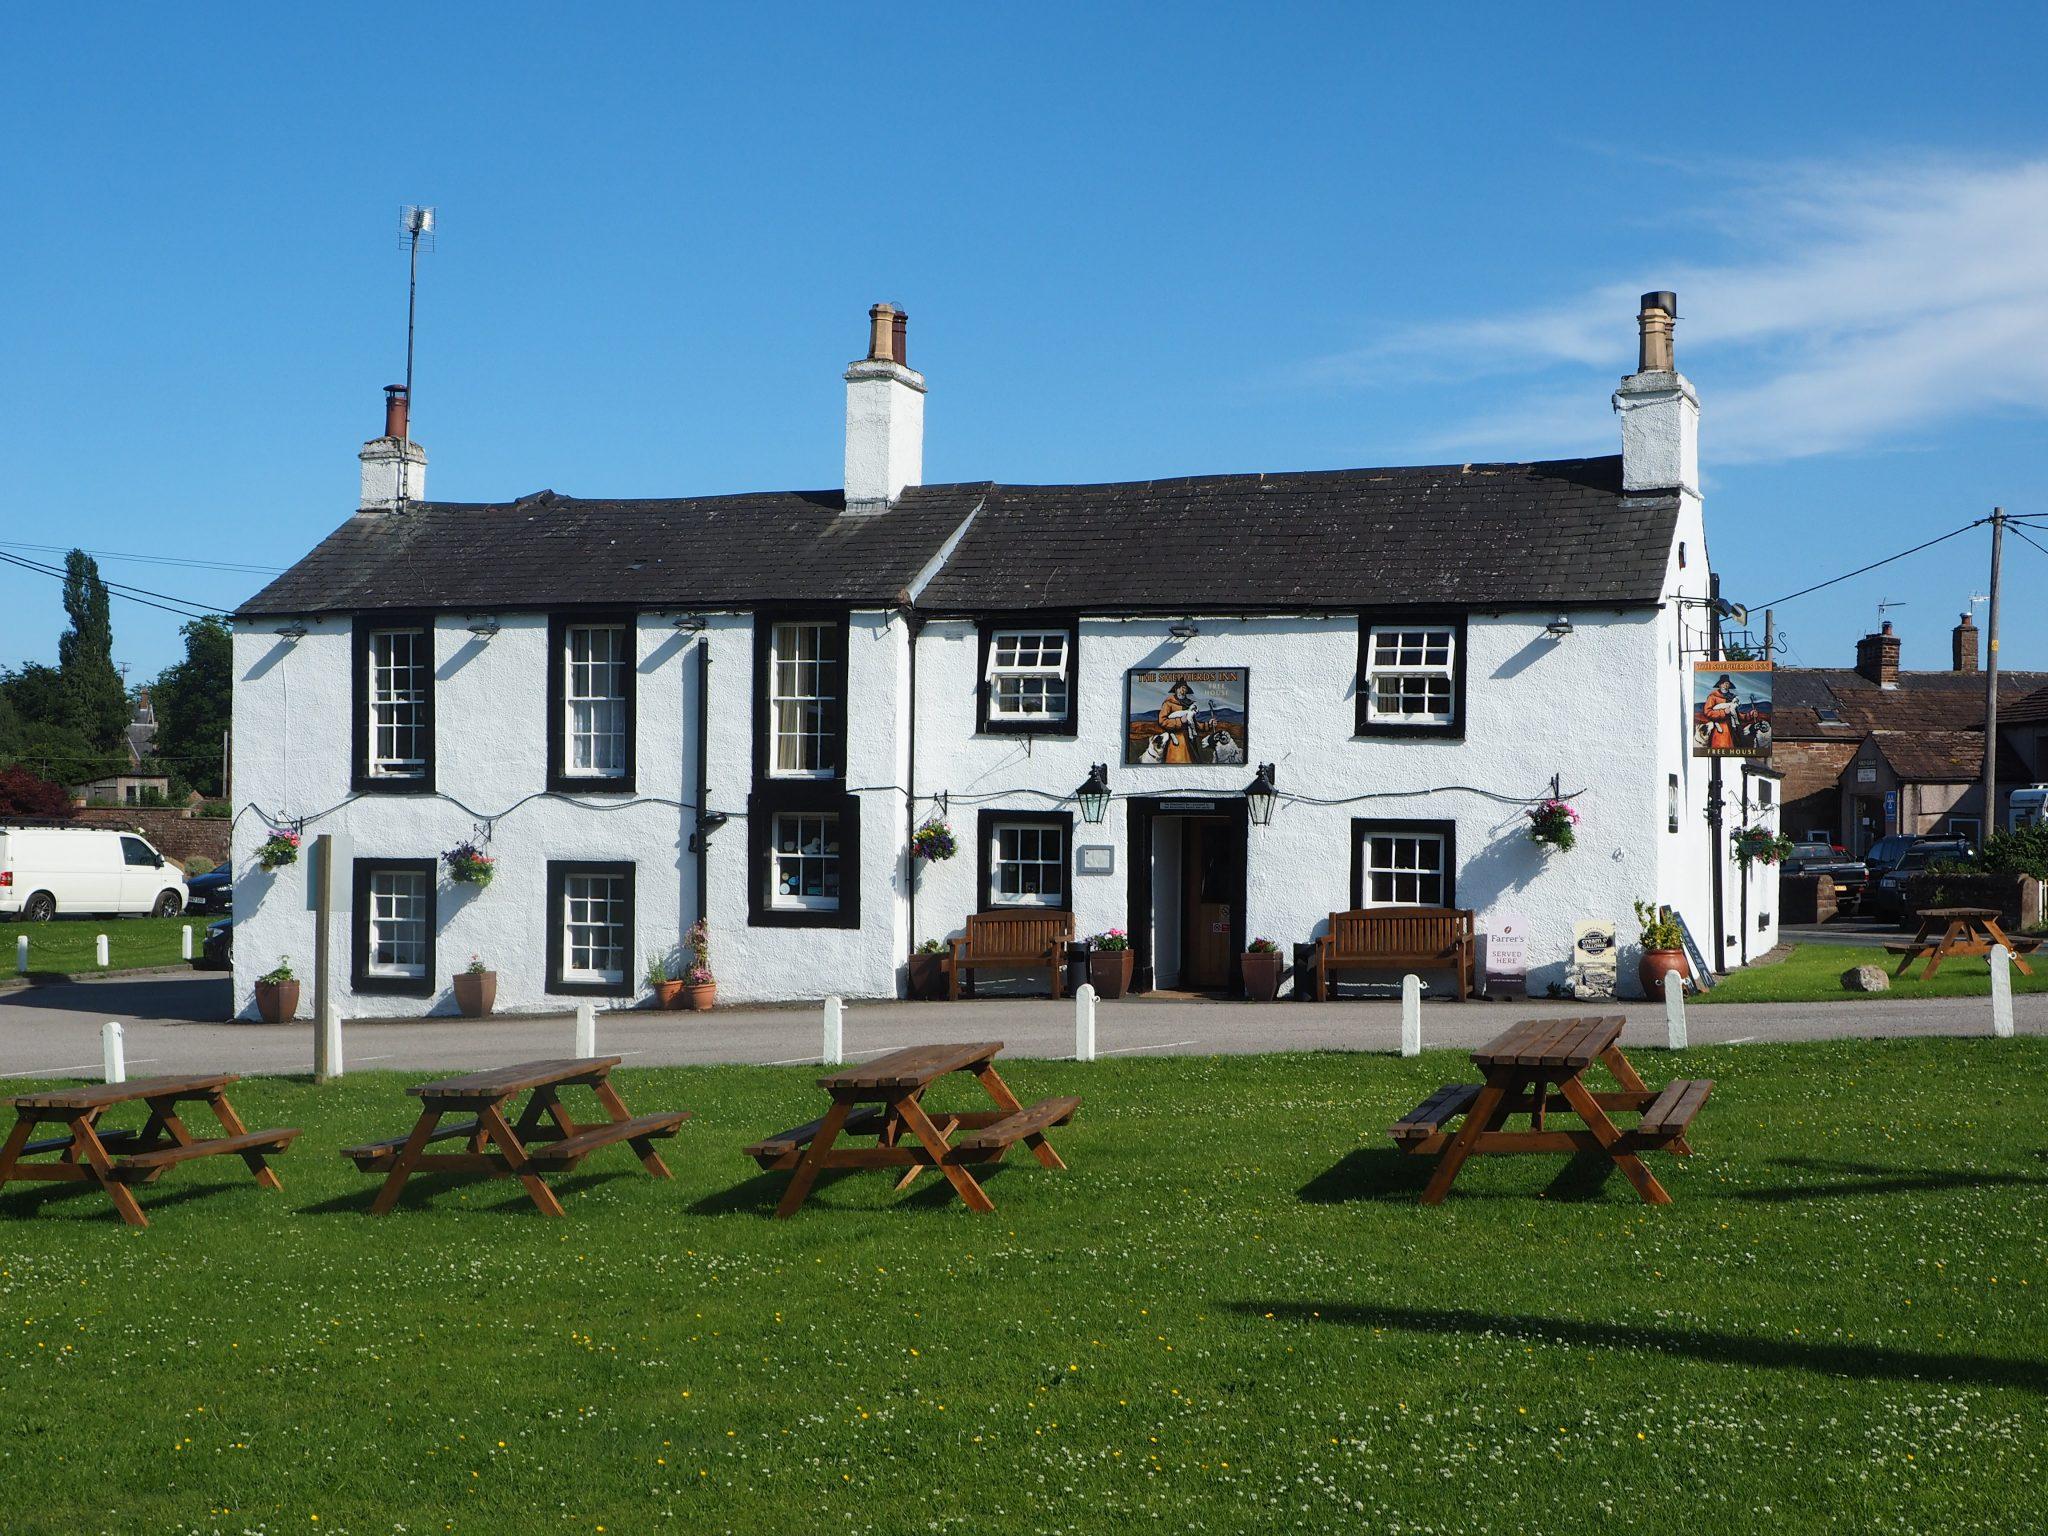 The Shepherds Inn, Langwathby